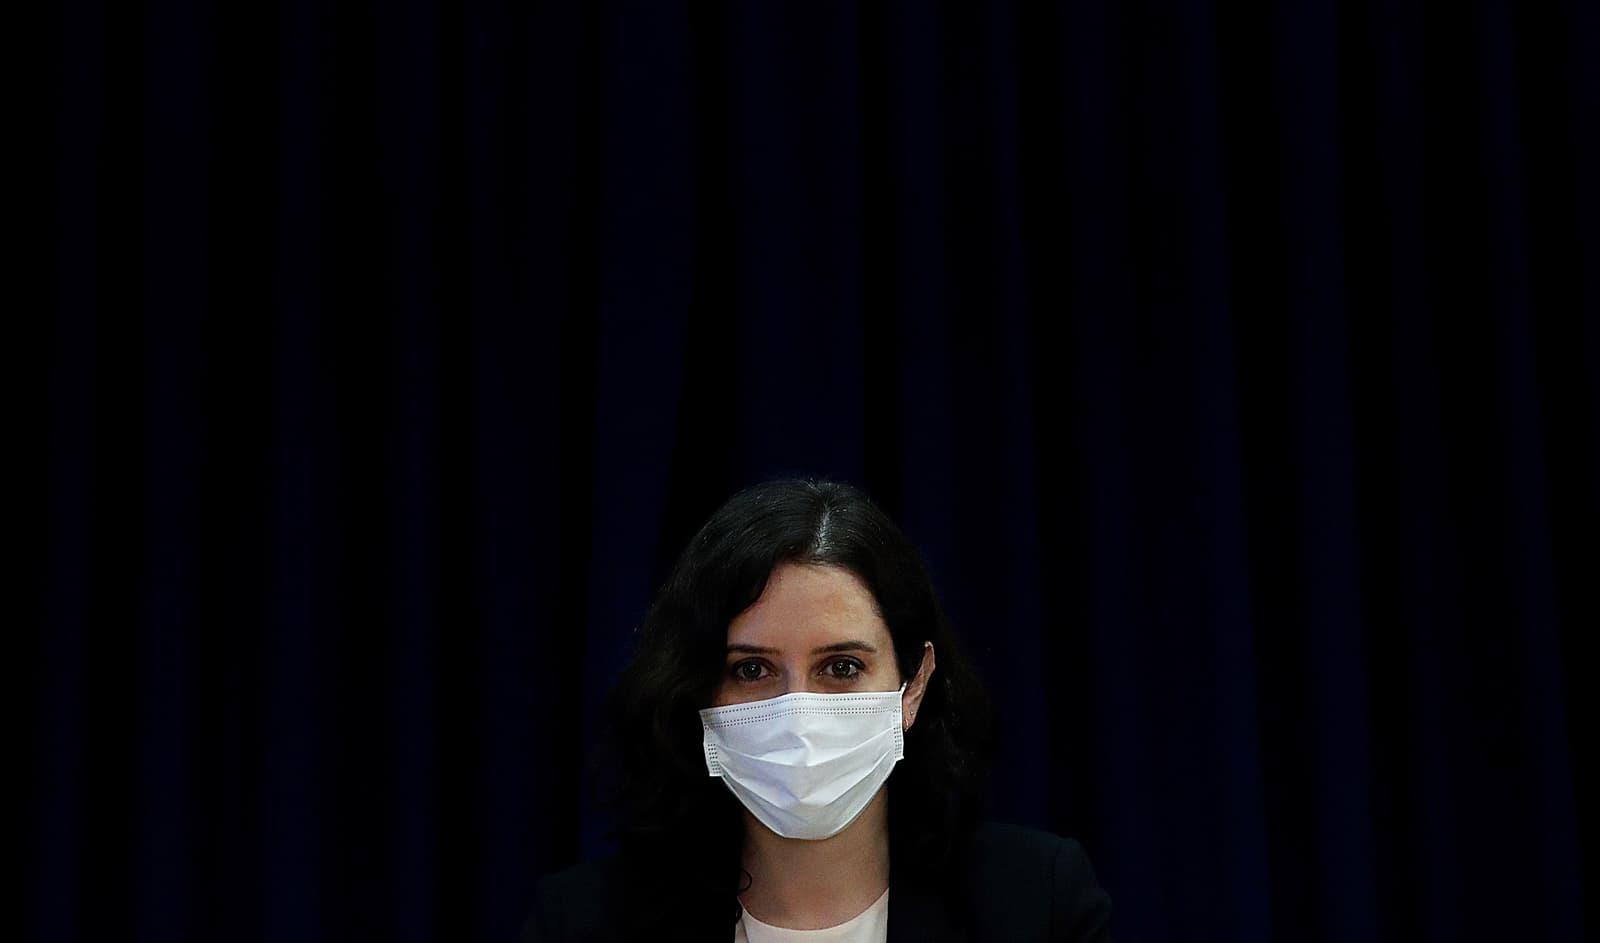 Isabel Díaz Ayuso en un acte de suport a l'hostaleria, el 3 de març a Pozuelo de Alarcón. Fotografia de Juan Carlos Hidalgo. Efe.